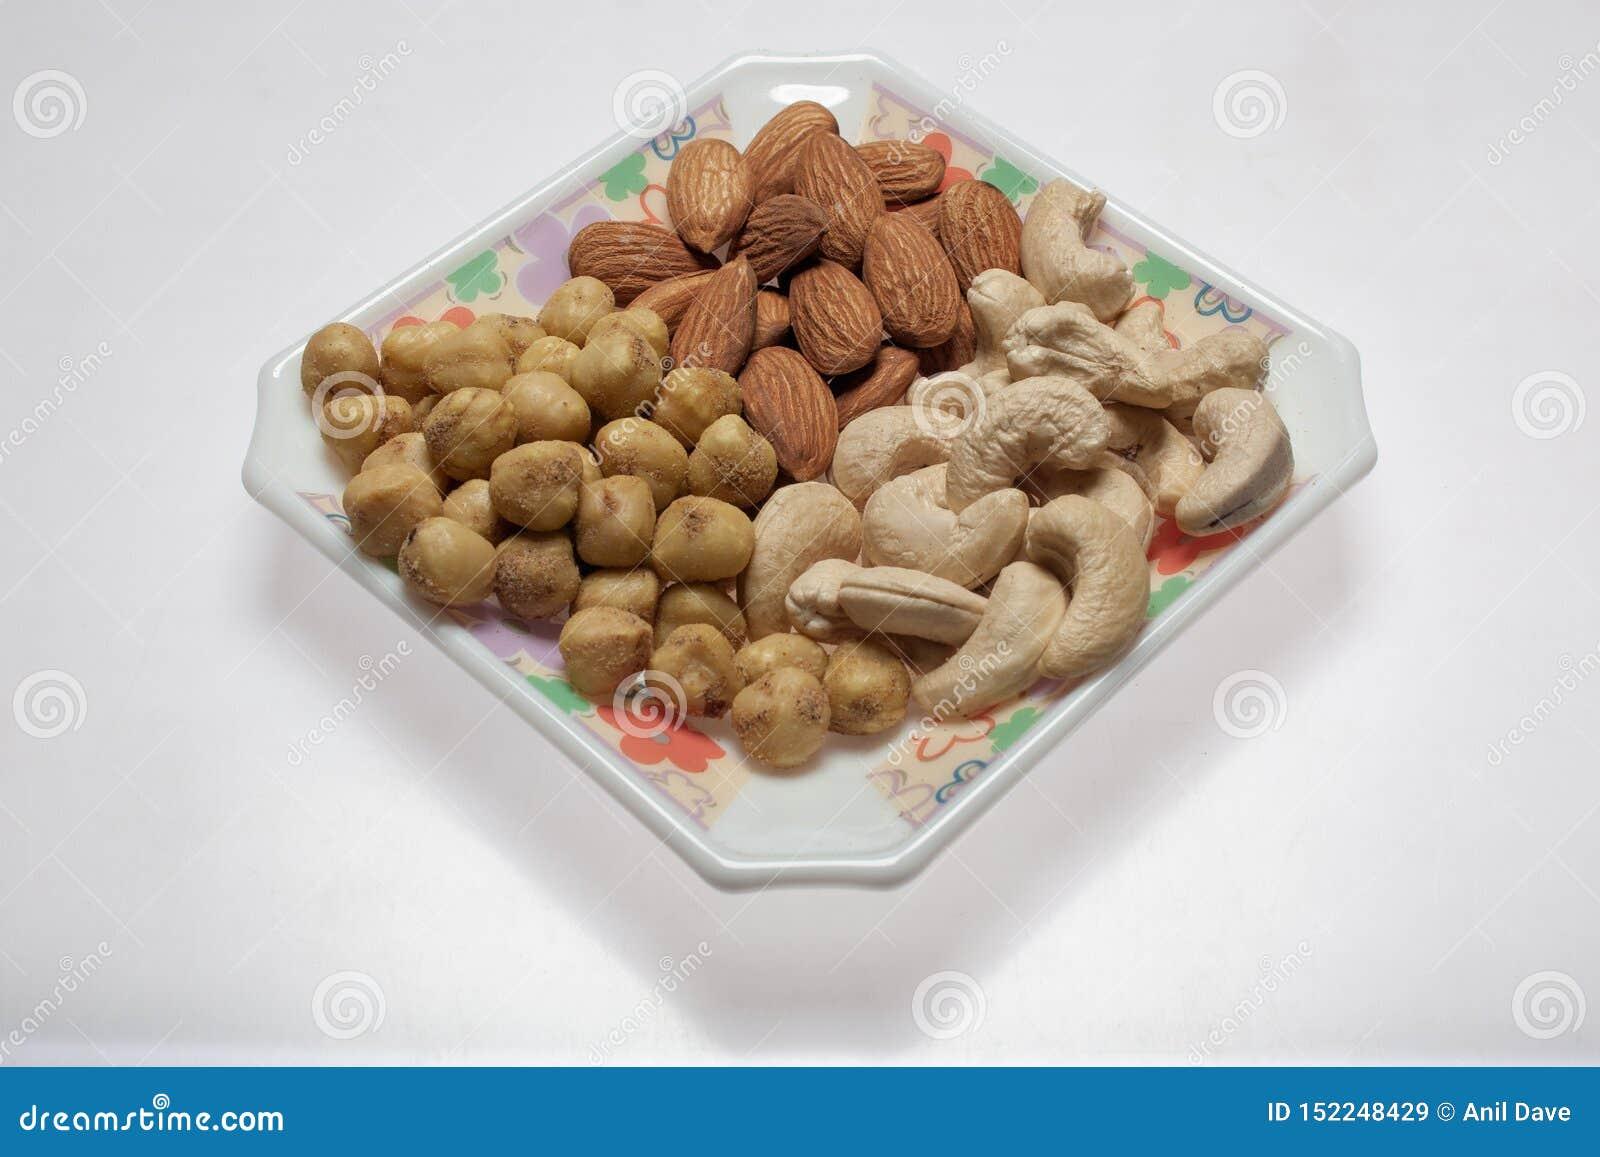 Dry roasted salted pistachio chickpea cashew nuts kalyan near mumbai maharashtra INDIA